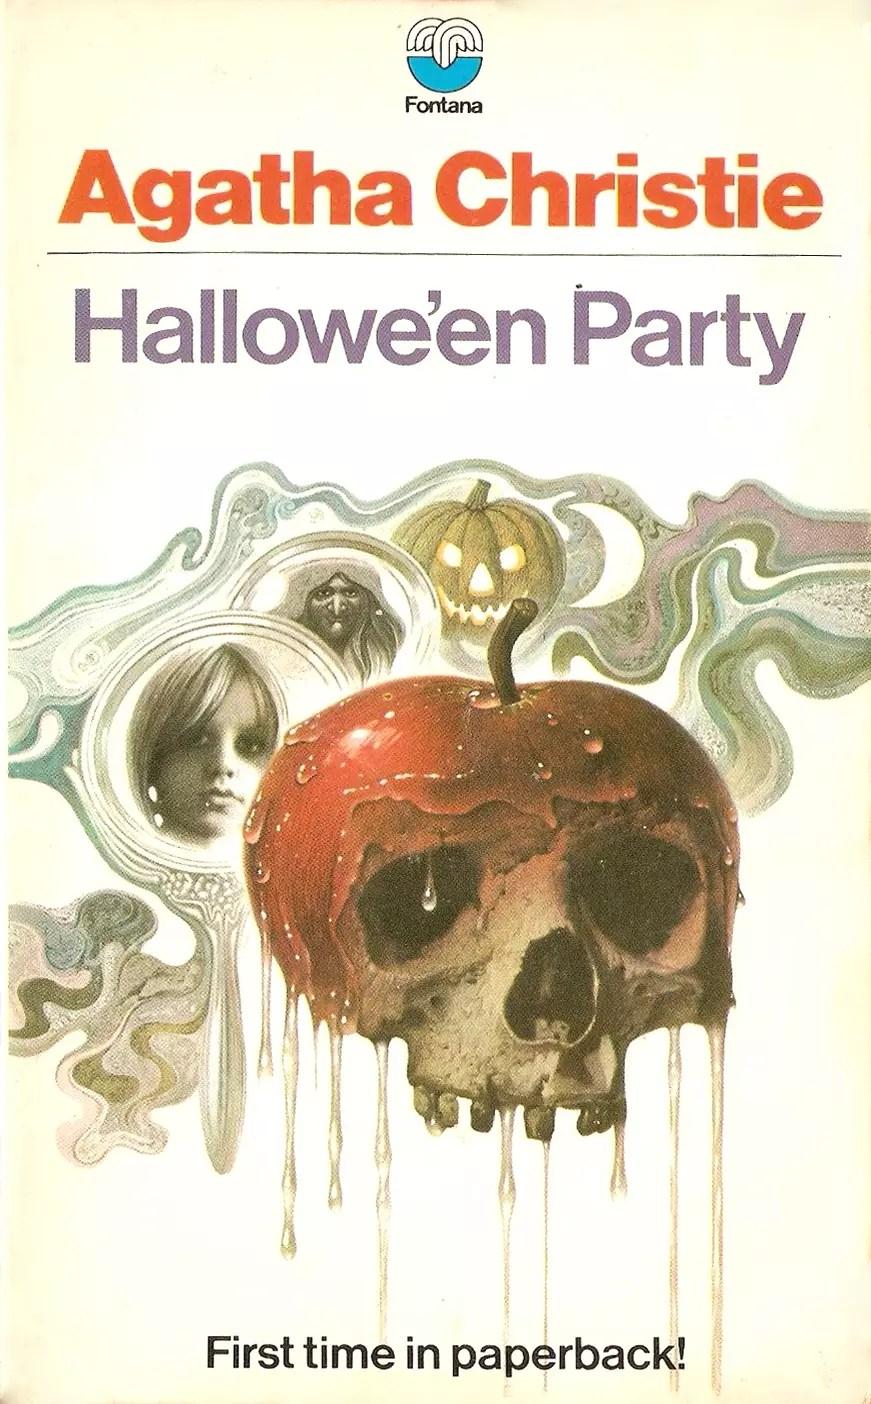 Agatha Christie Tom Adams Halloween Party Fontana